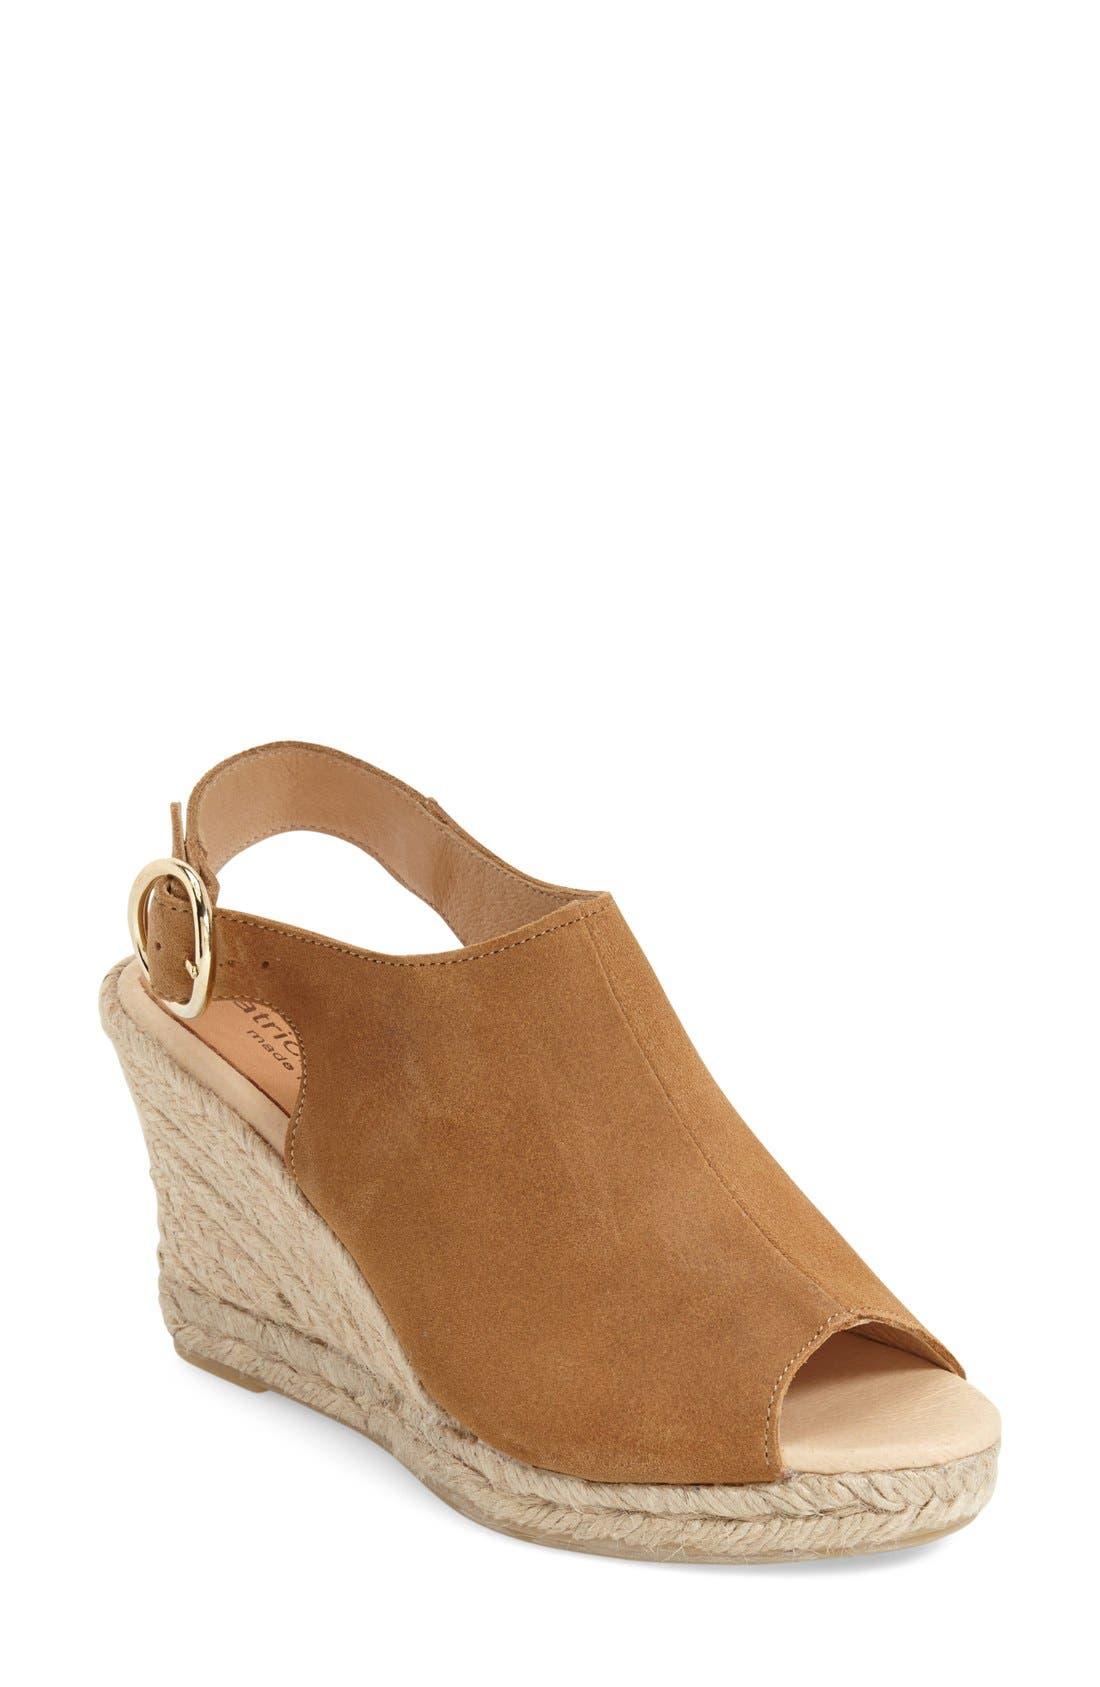 PATRICIA GREEN 'Belle' Espadrille Wedge Sandal, Main, color, 200